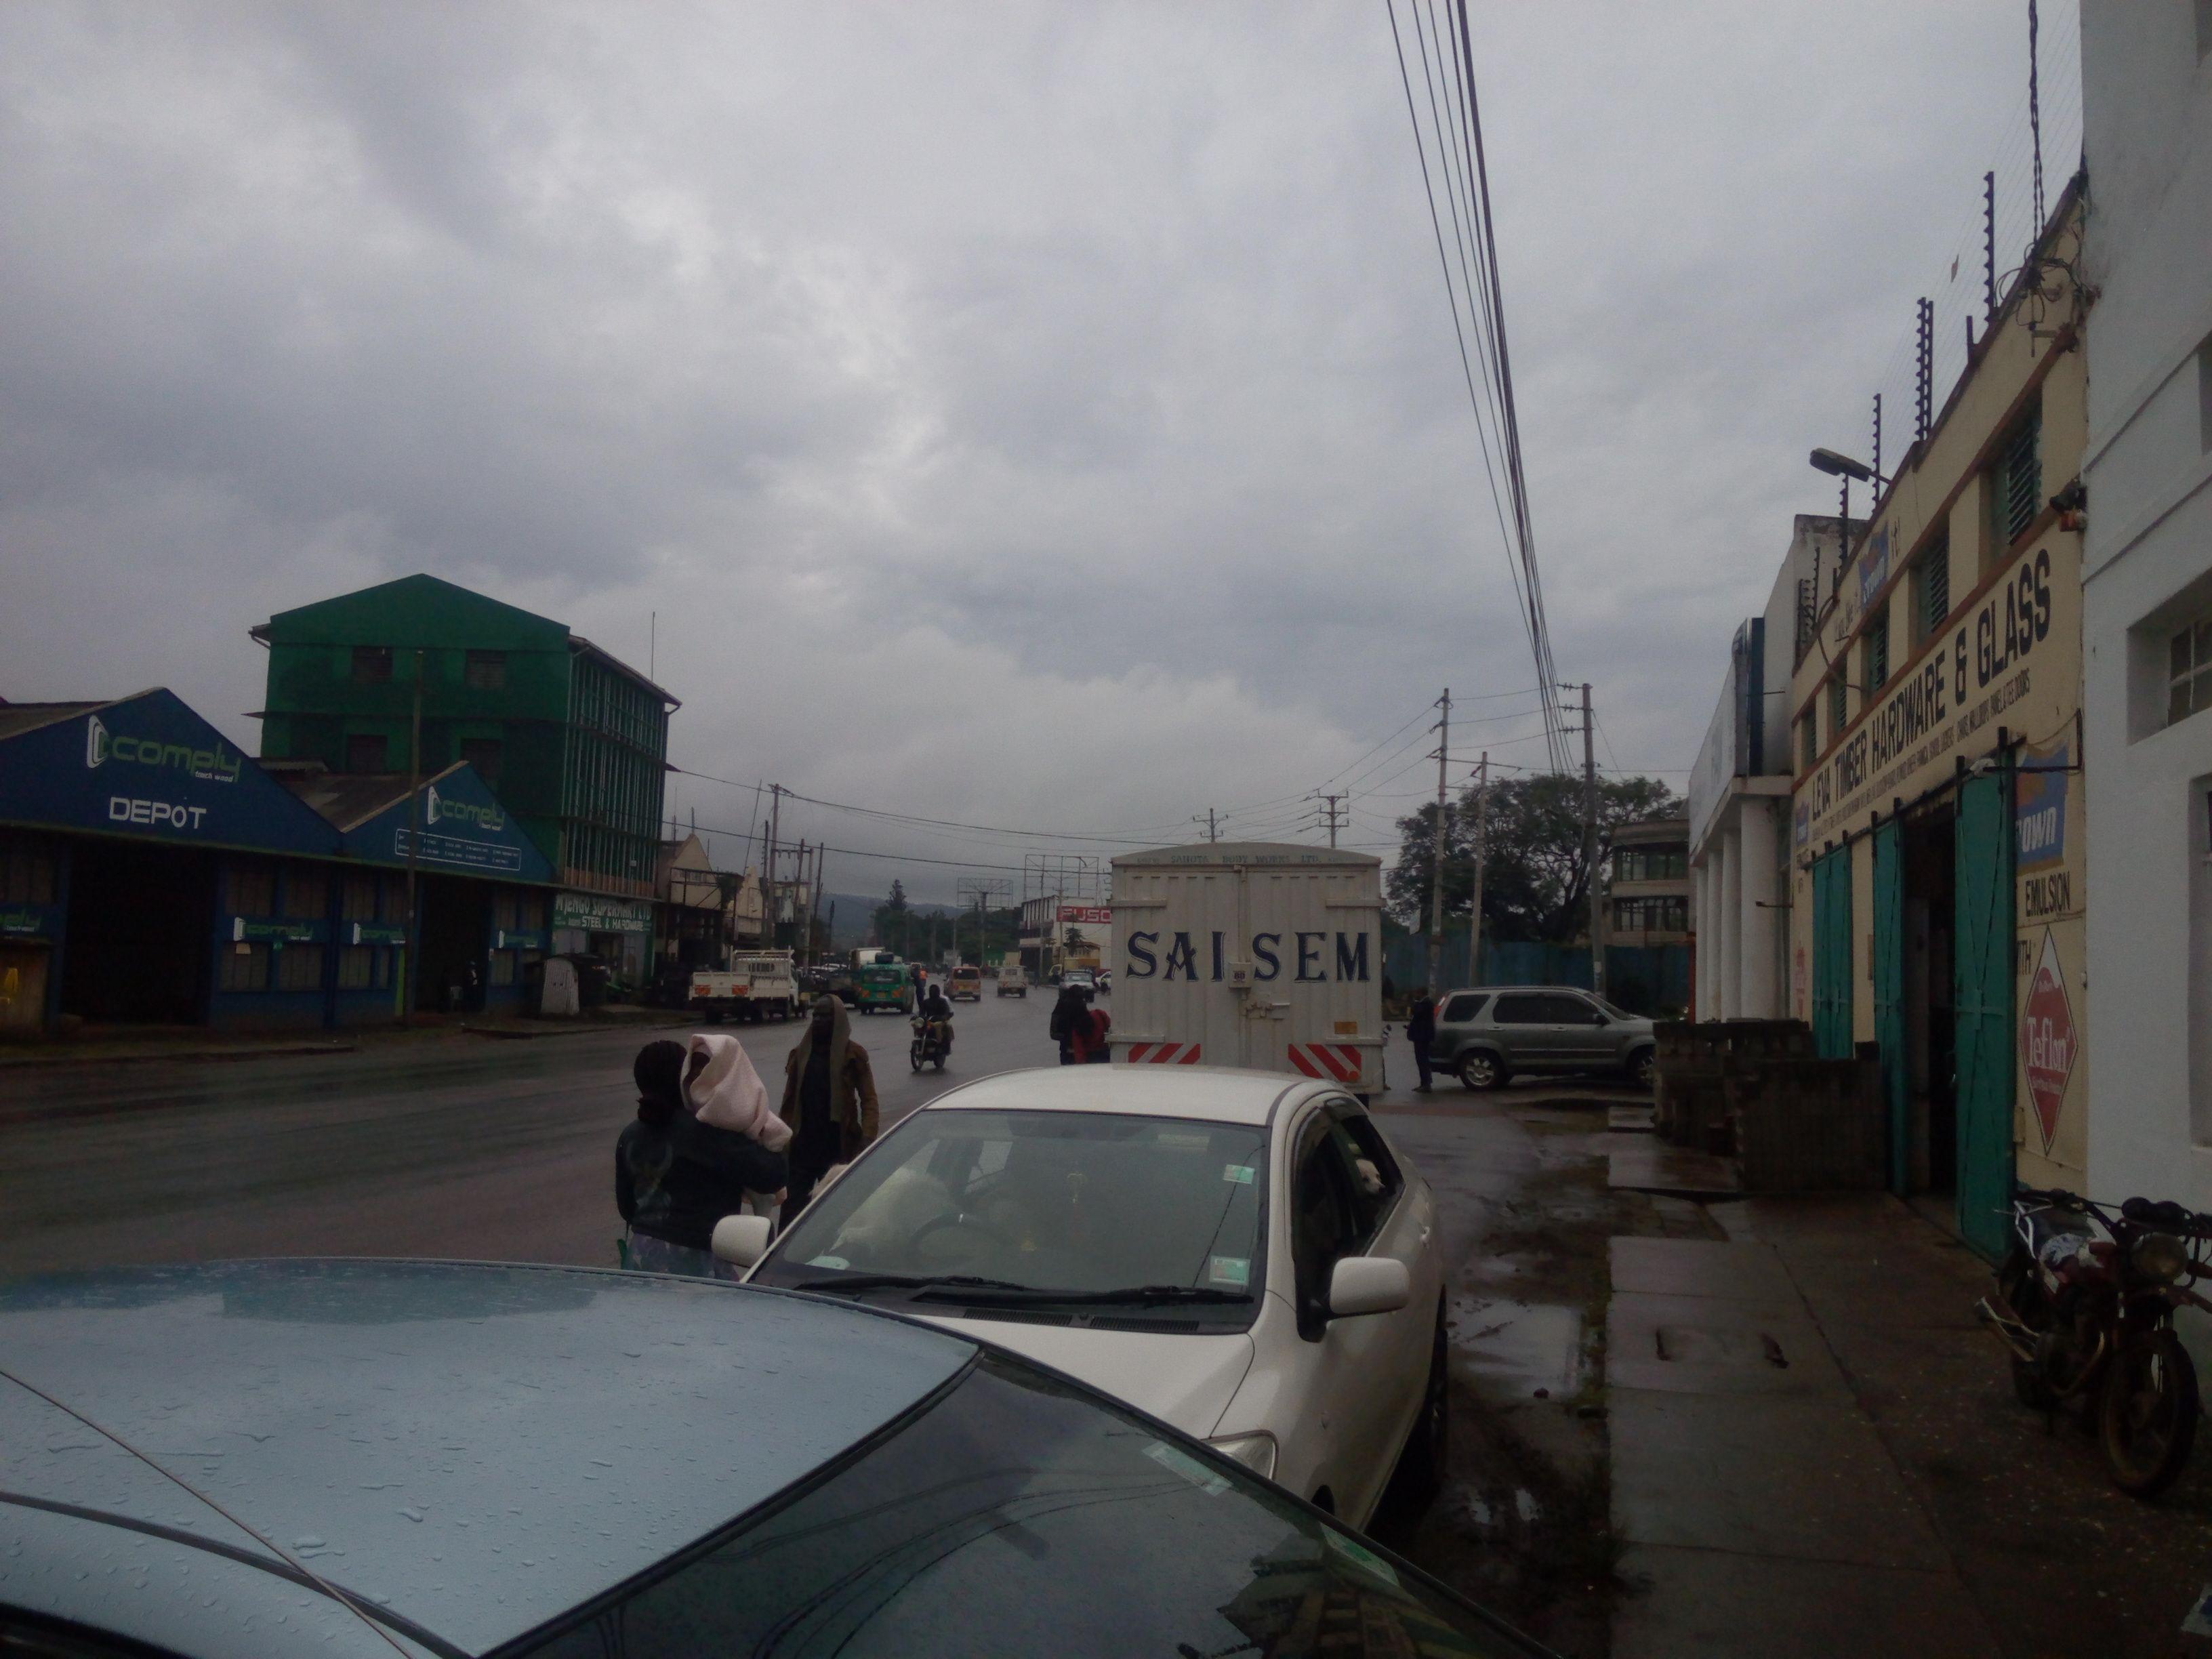 Godown For Sale Obote Road Kisumu Measuring 14 500sqf Kisumu Cctv Surveillance Road